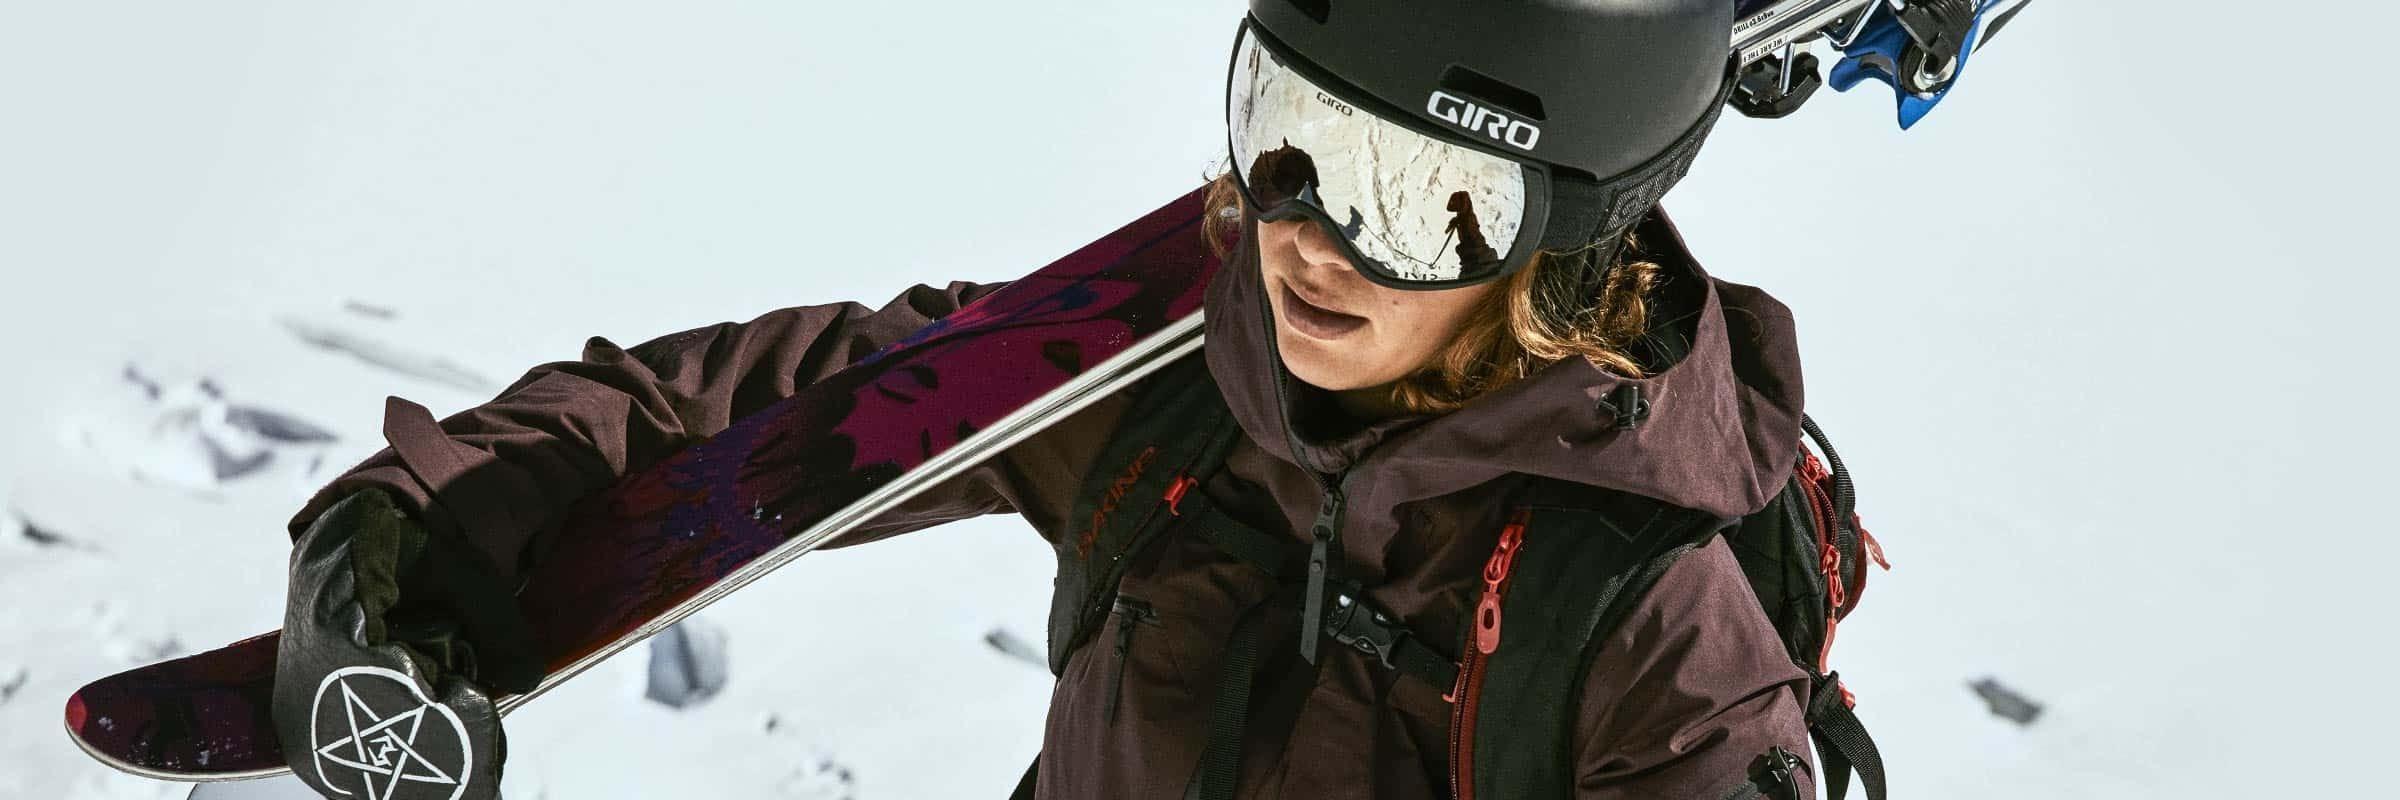 online store 73576 b56c9 Discover the 2018 Peak Performance Ski Kits | Altitude Blog